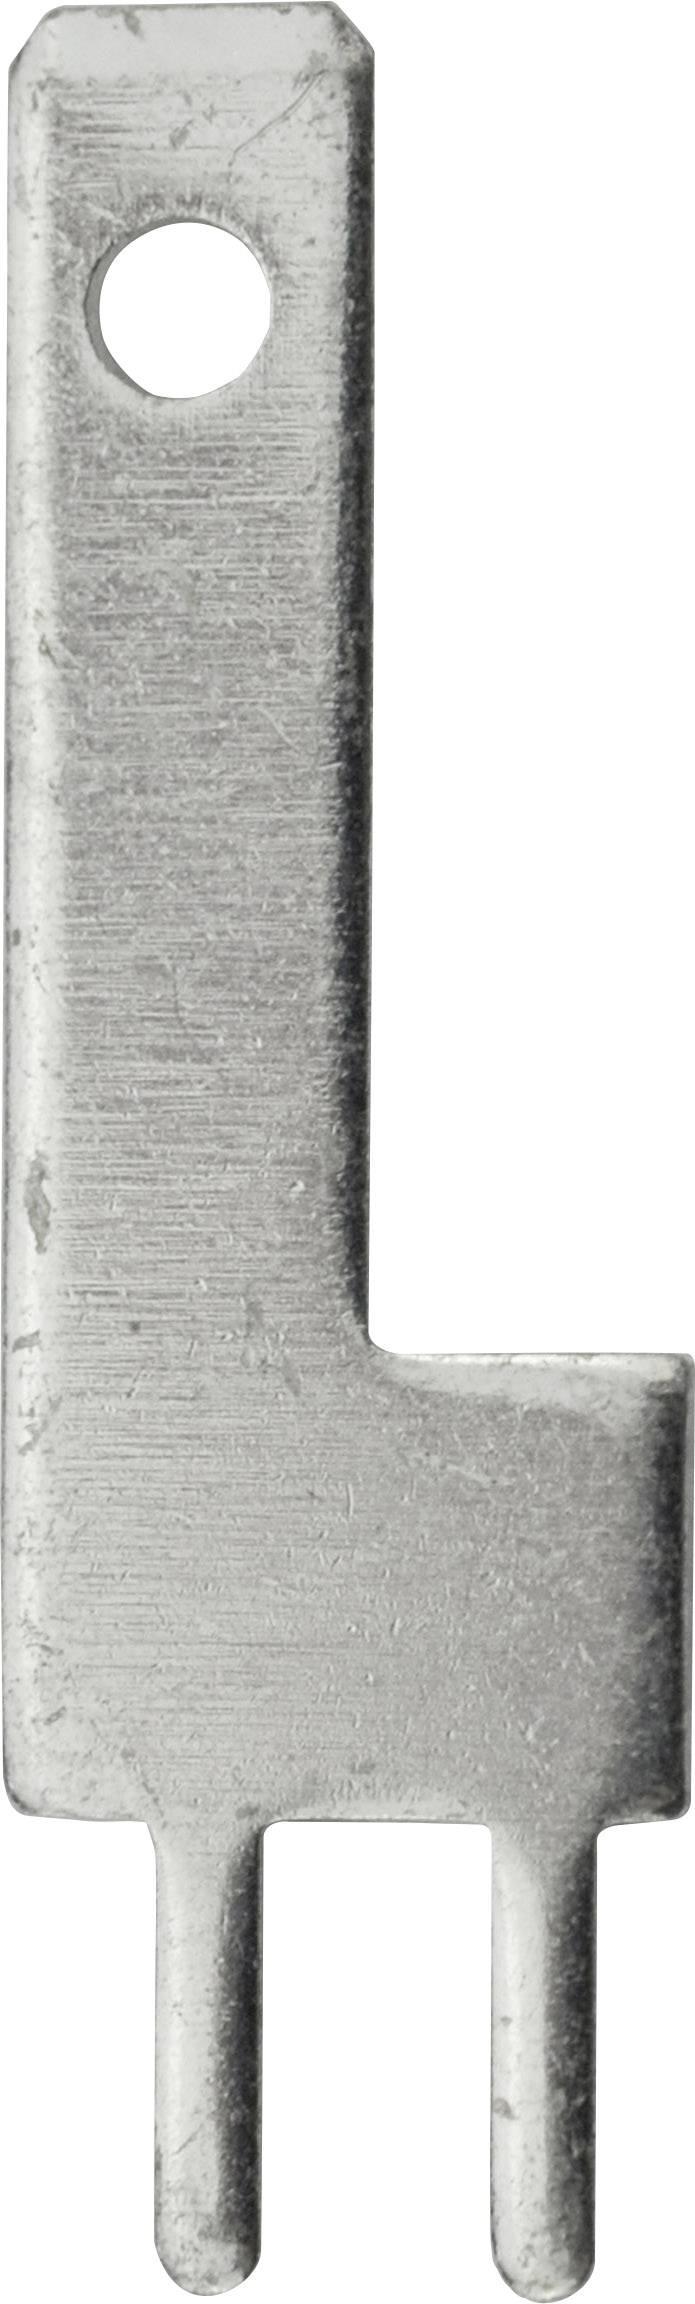 Faston zástrčka Vogt Verbindungstechnik 3785q08.68 2.8 mm x 0.8 mm, 180 °, bez izolace, kov, 100 ks